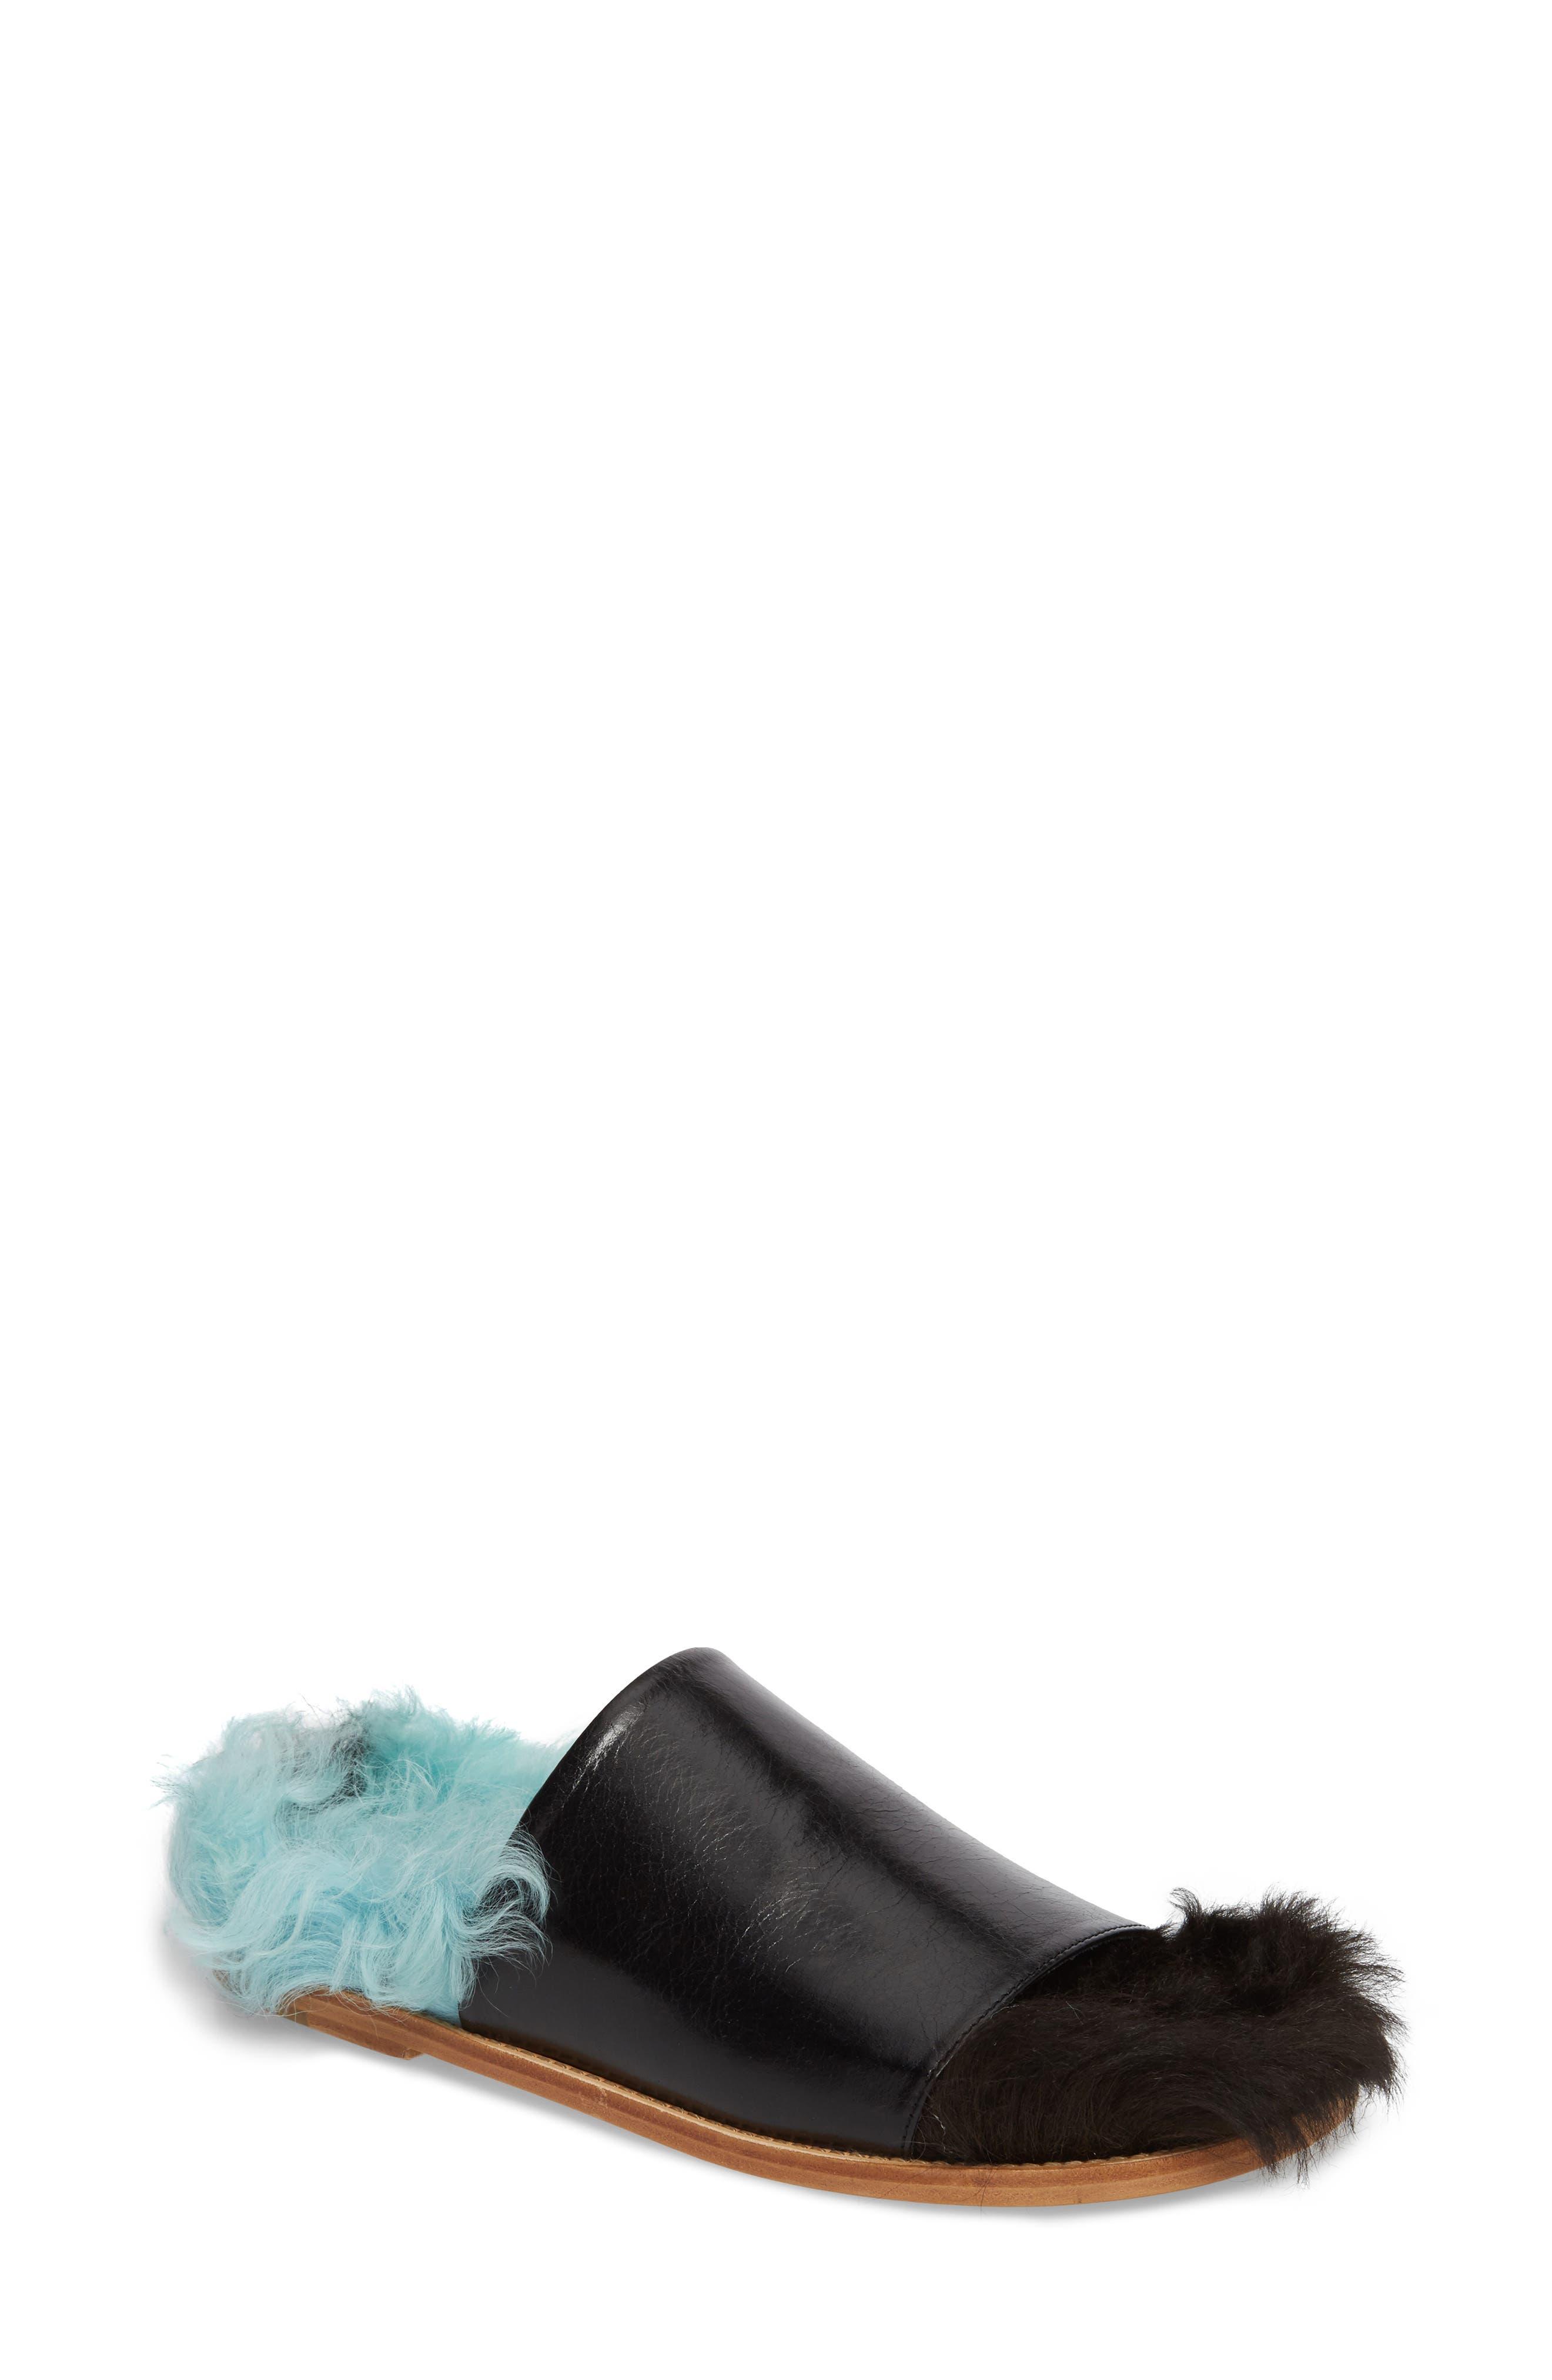 Marques'Almeida Genuine Shearling Slide Sandal (Women)